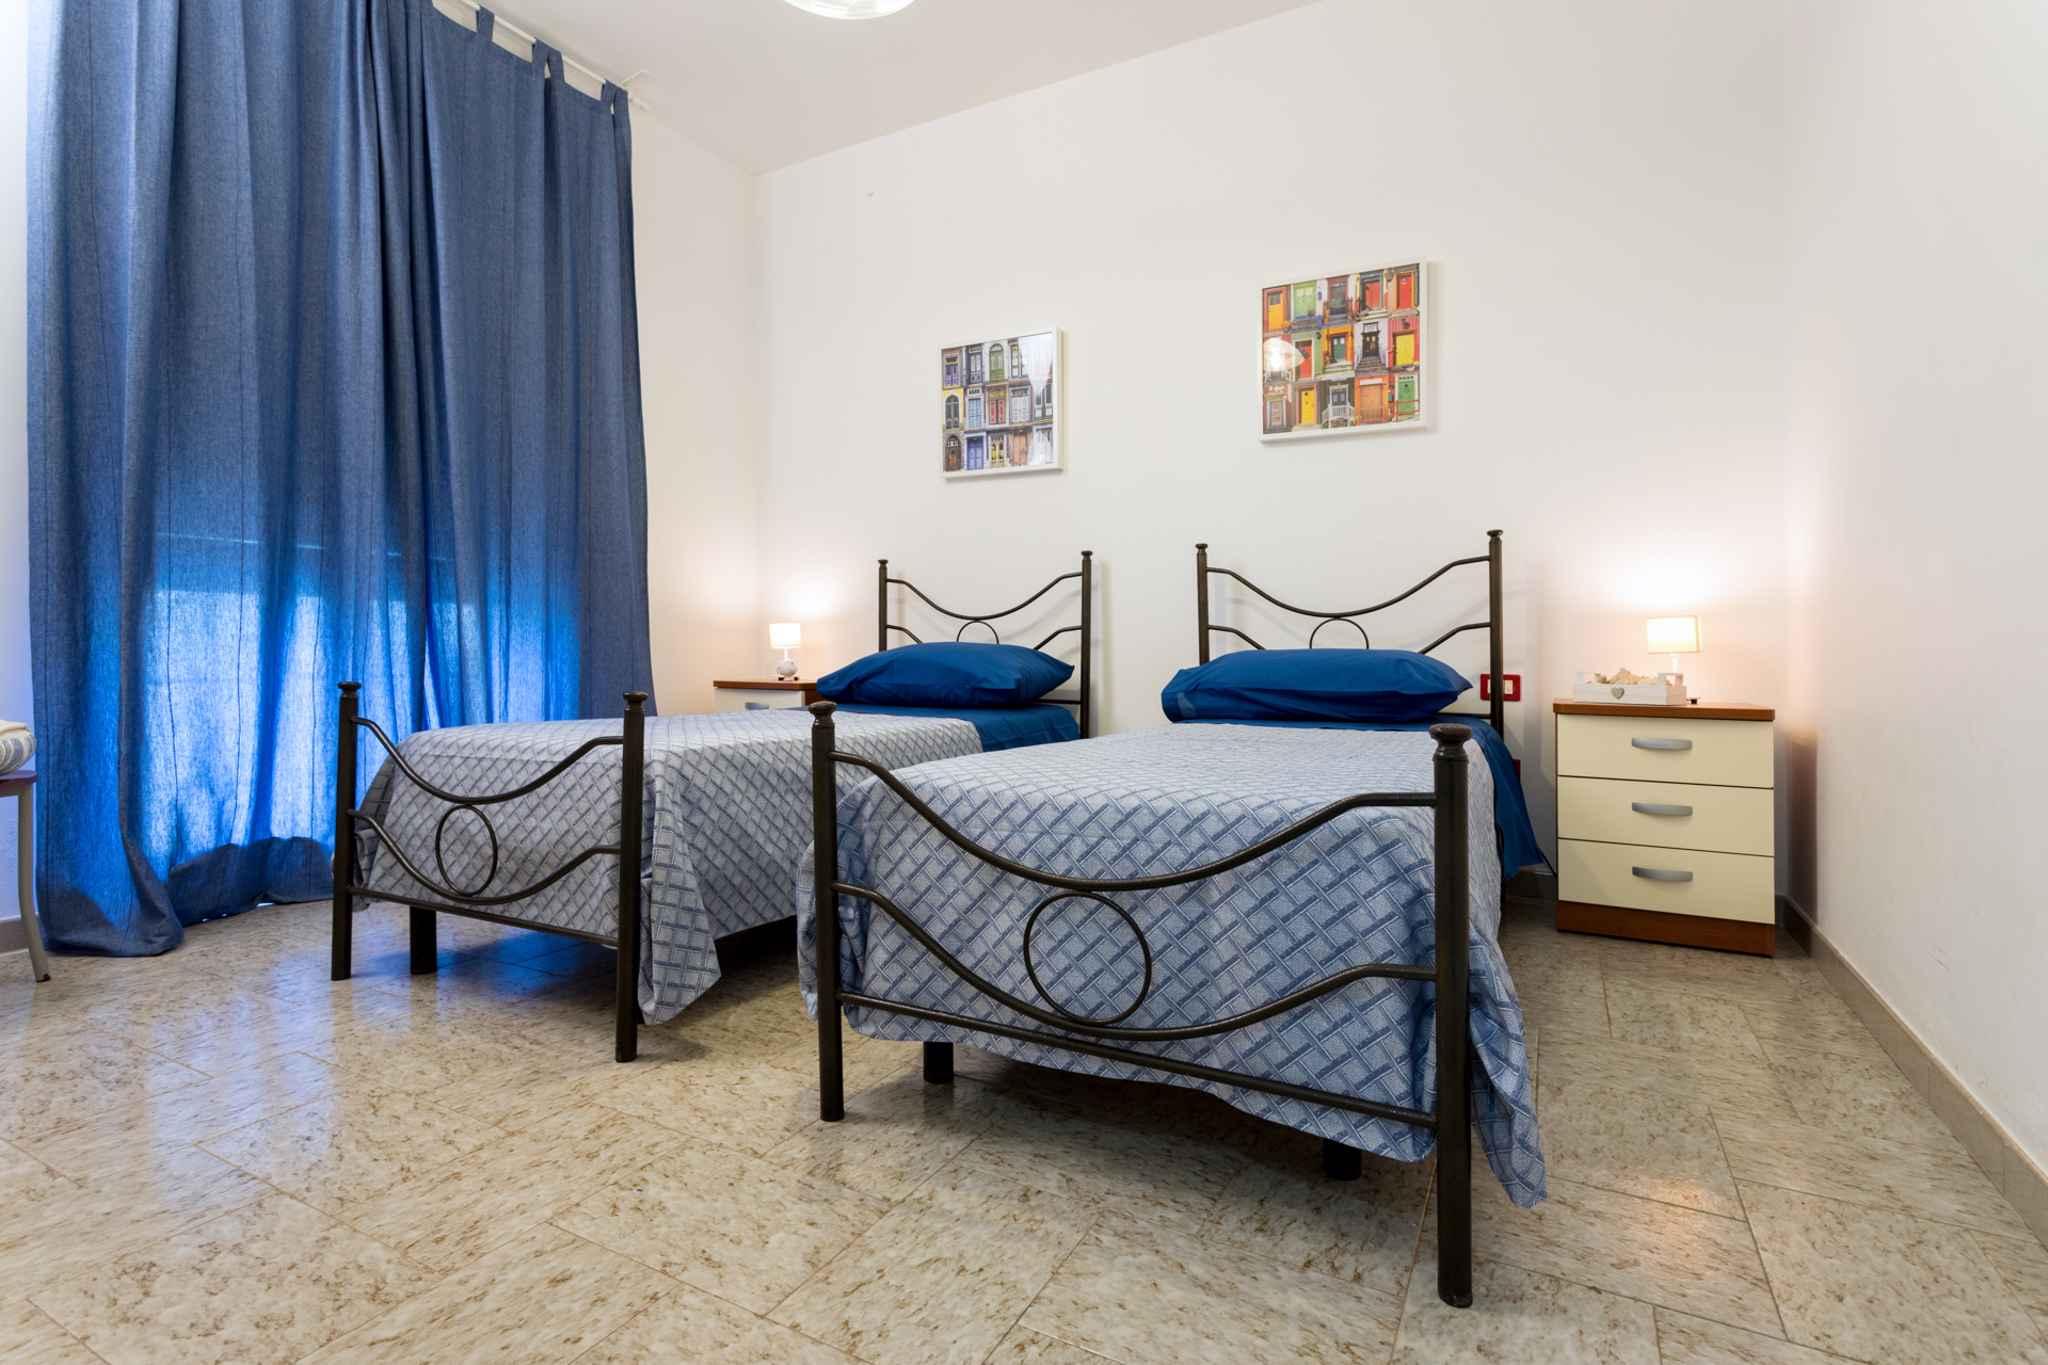 Ferienhaus Vicino Al Mare (560014), Alliste, Lecce, Apulien, Italien, Bild 15